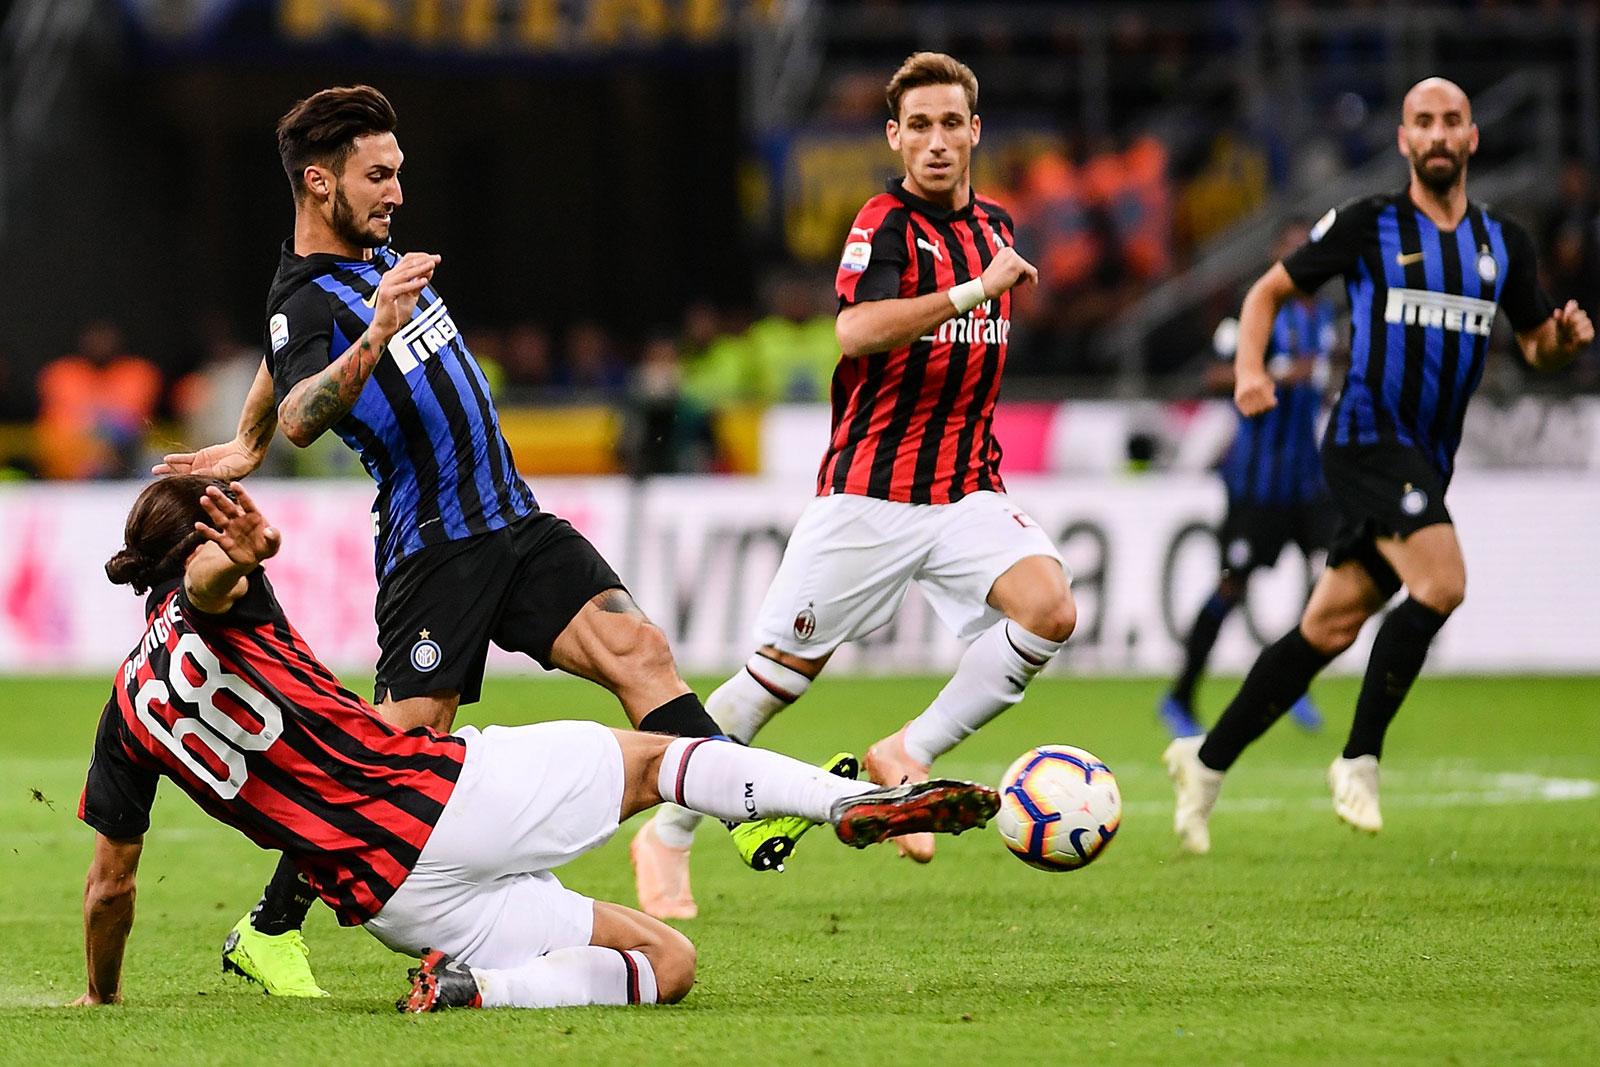 Ricardo Rodriguez and Matteo Politano during Inter-Milan at Stadio San Siro on October 21, 2018. (MARCO BERTORELLO/AFP/Getty Images)